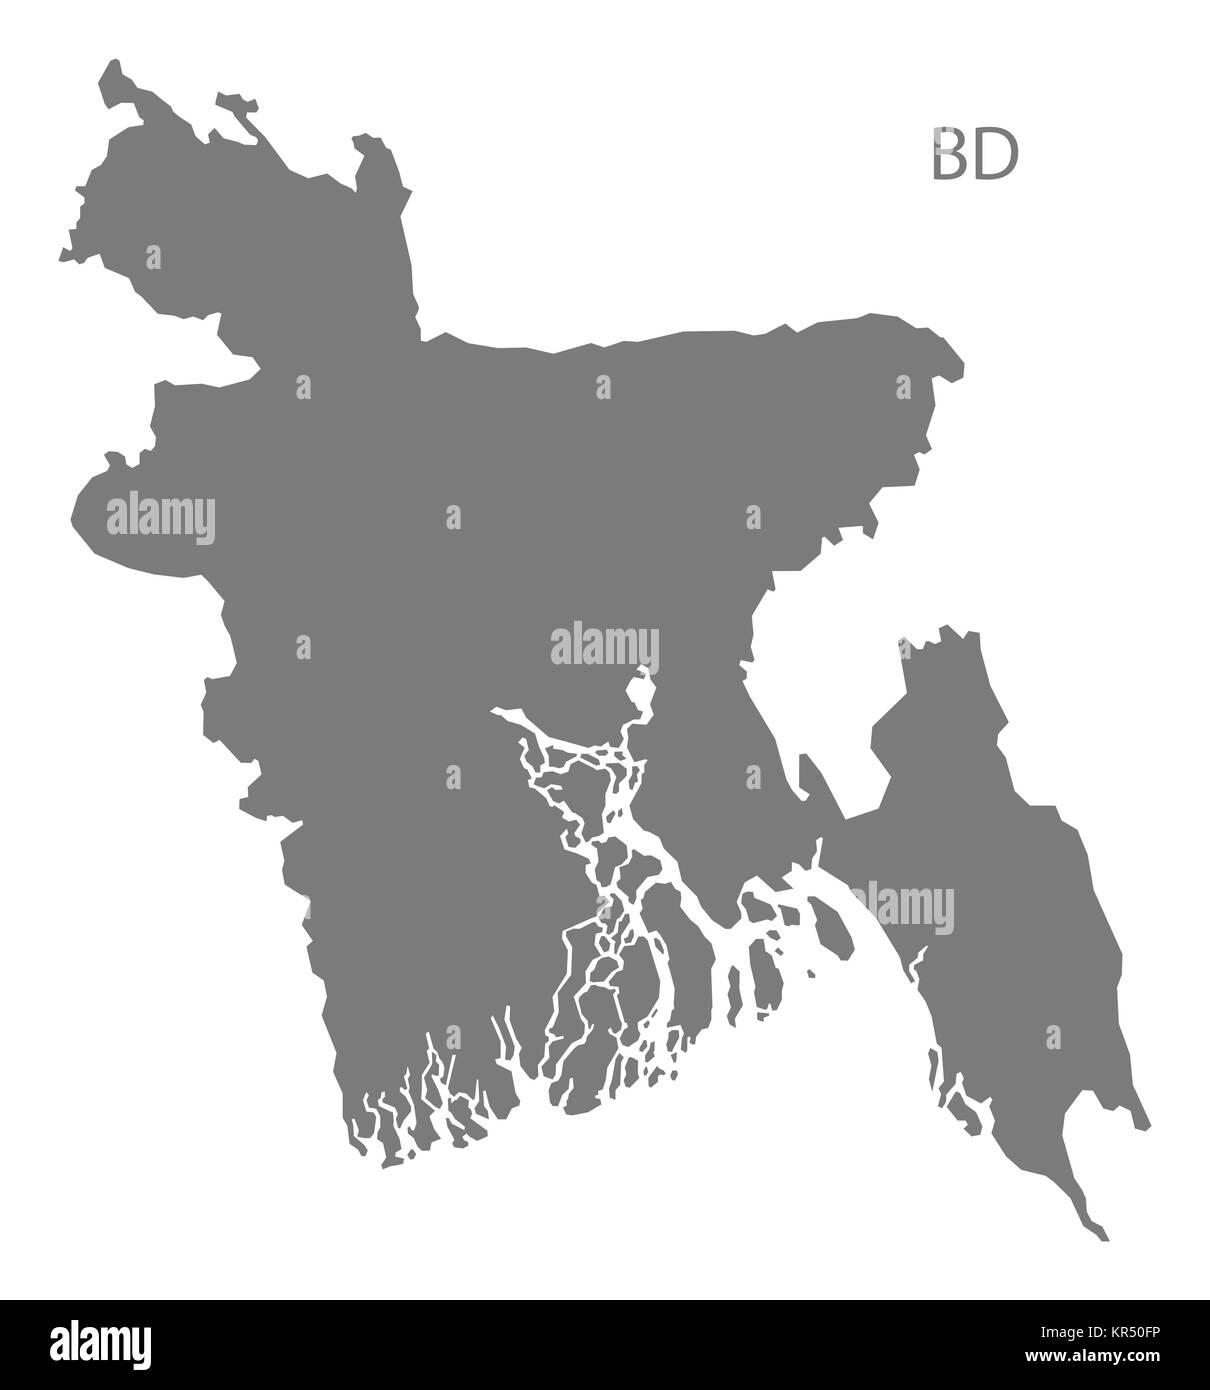 Bangladesh Map Stock Photos Bangladesh Map Stock Images Alamy - Bangladesh map